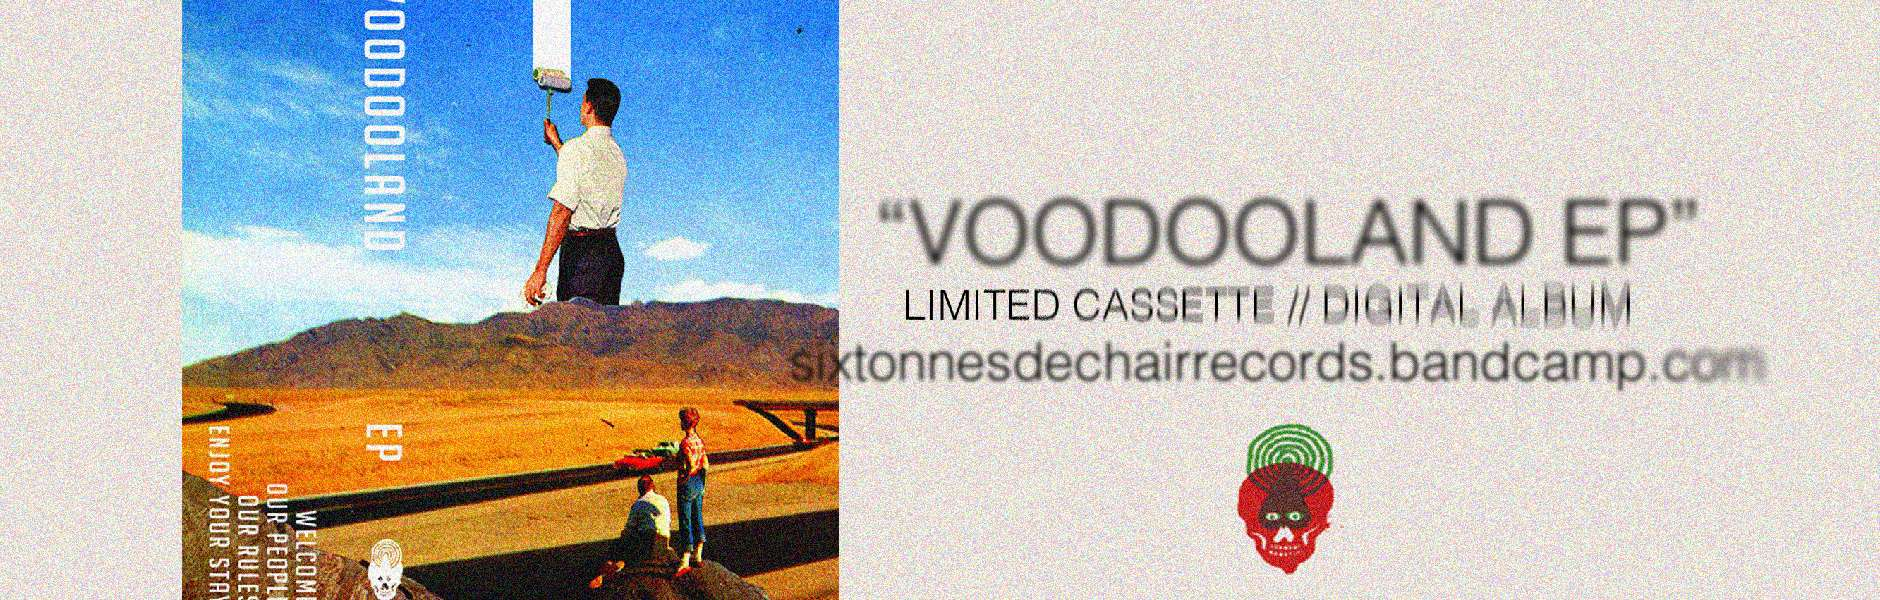 voodooland